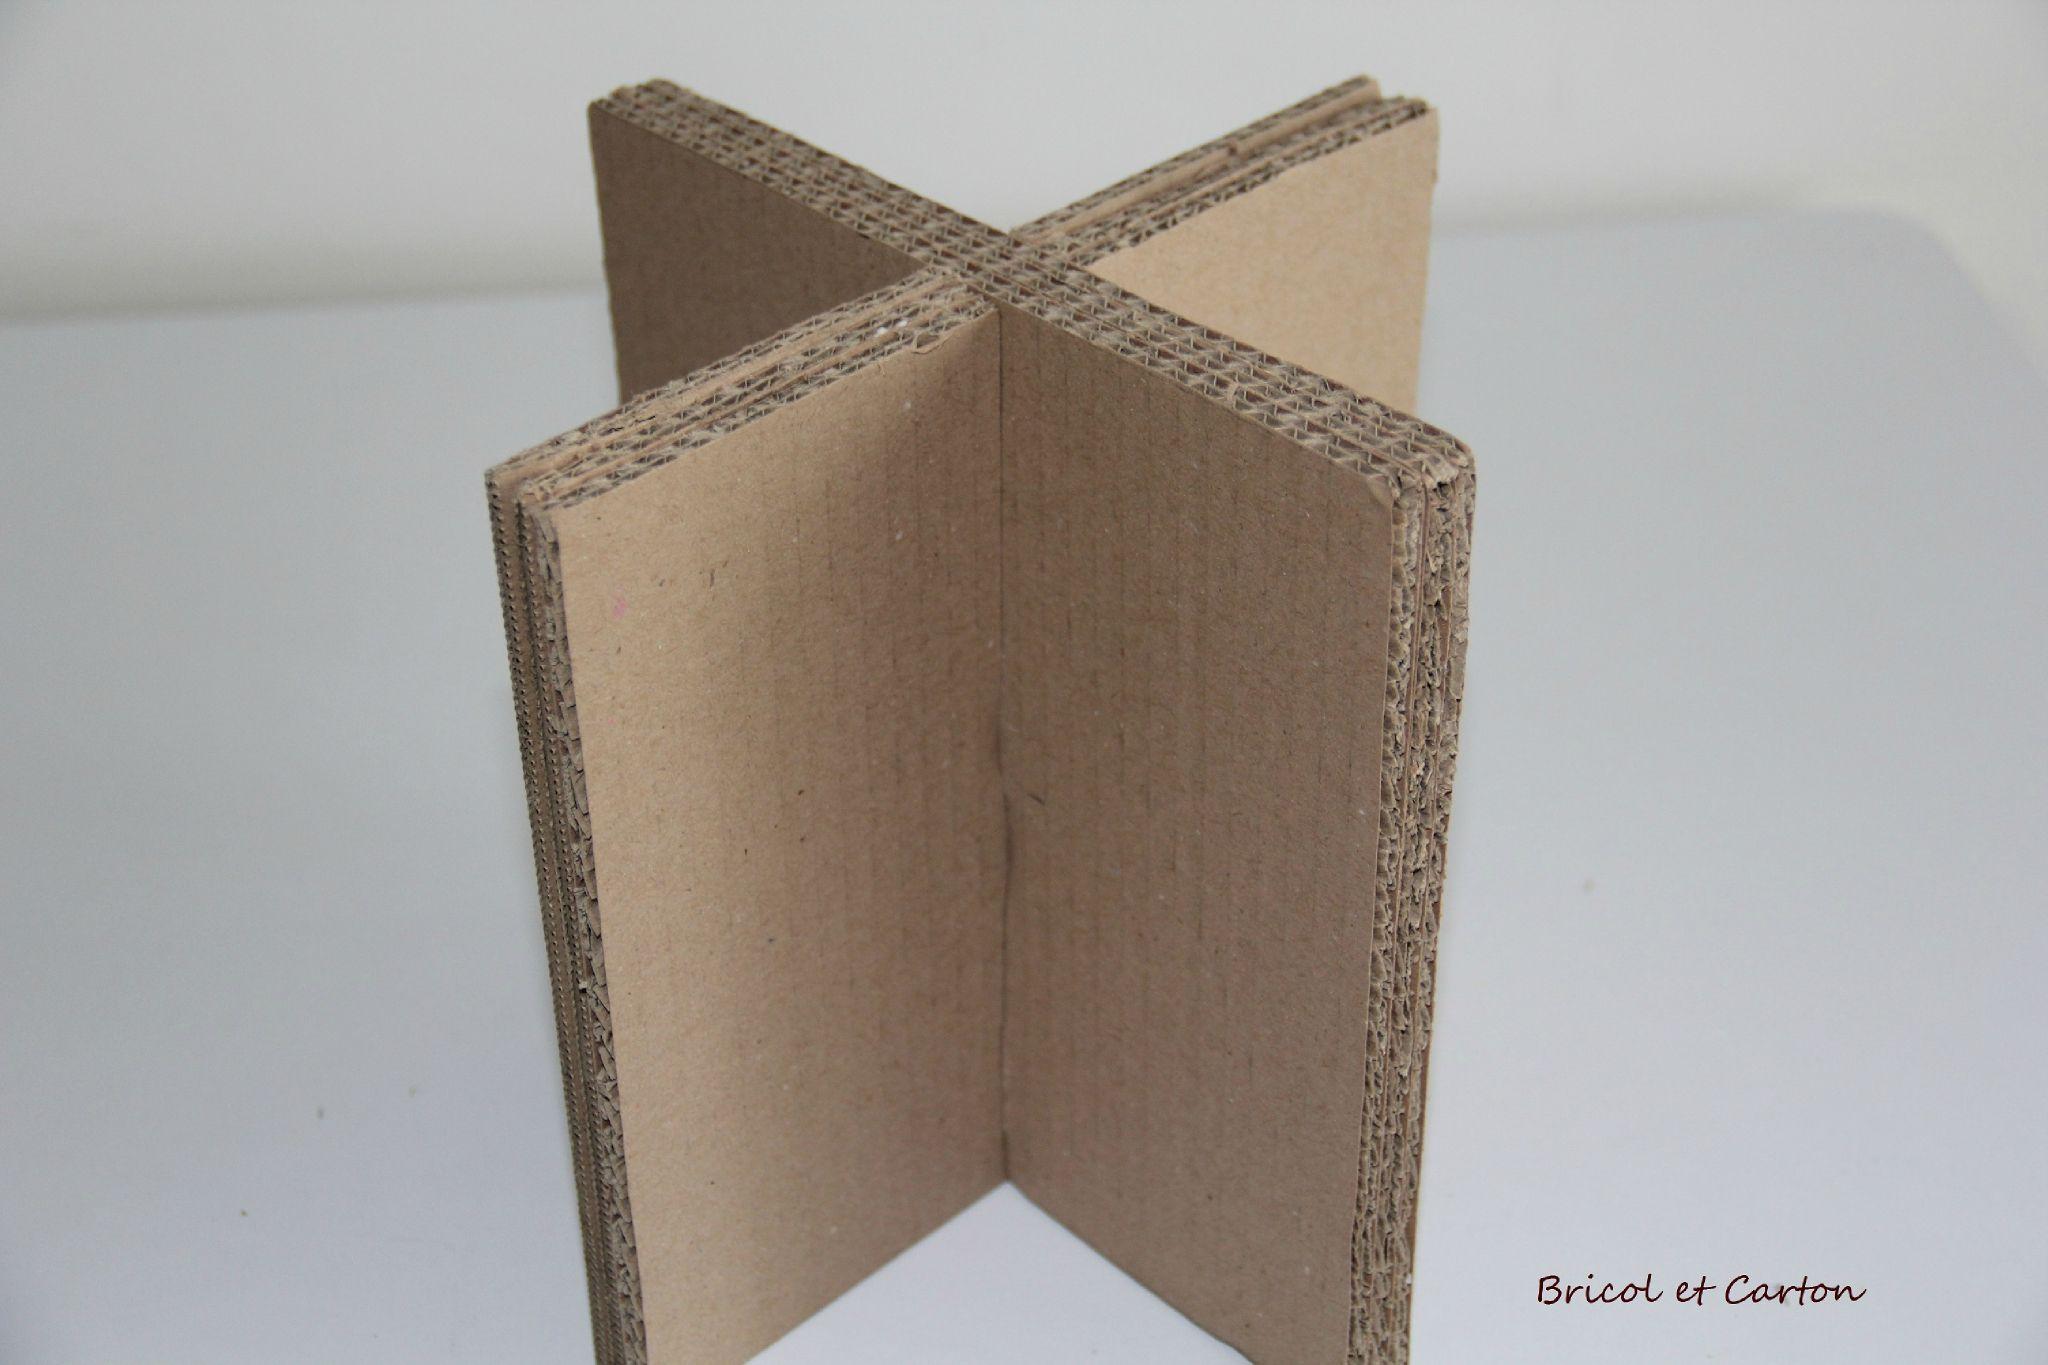 Image De Meuble En Carton tabouret en carton design - kumpalo.parkersydnorhistoric